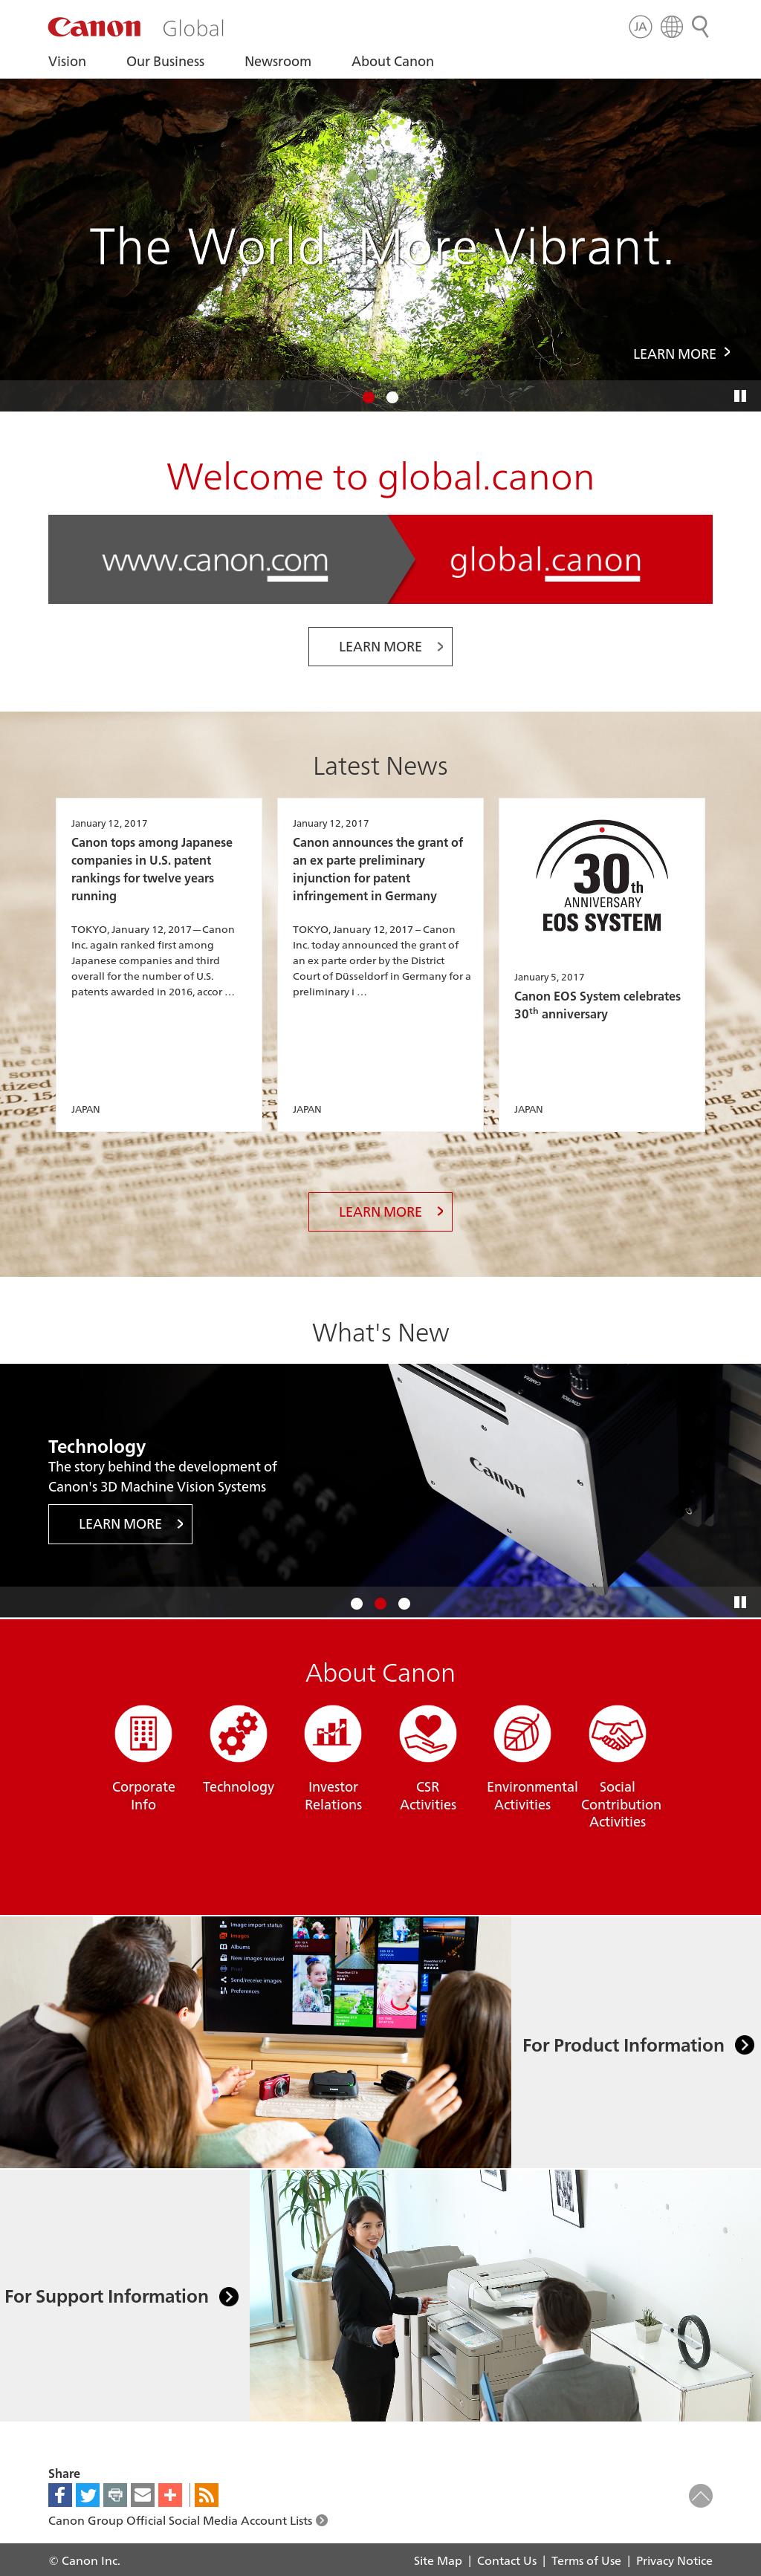 Canon Competitors, Revenue and Employees - Owler Company Profile